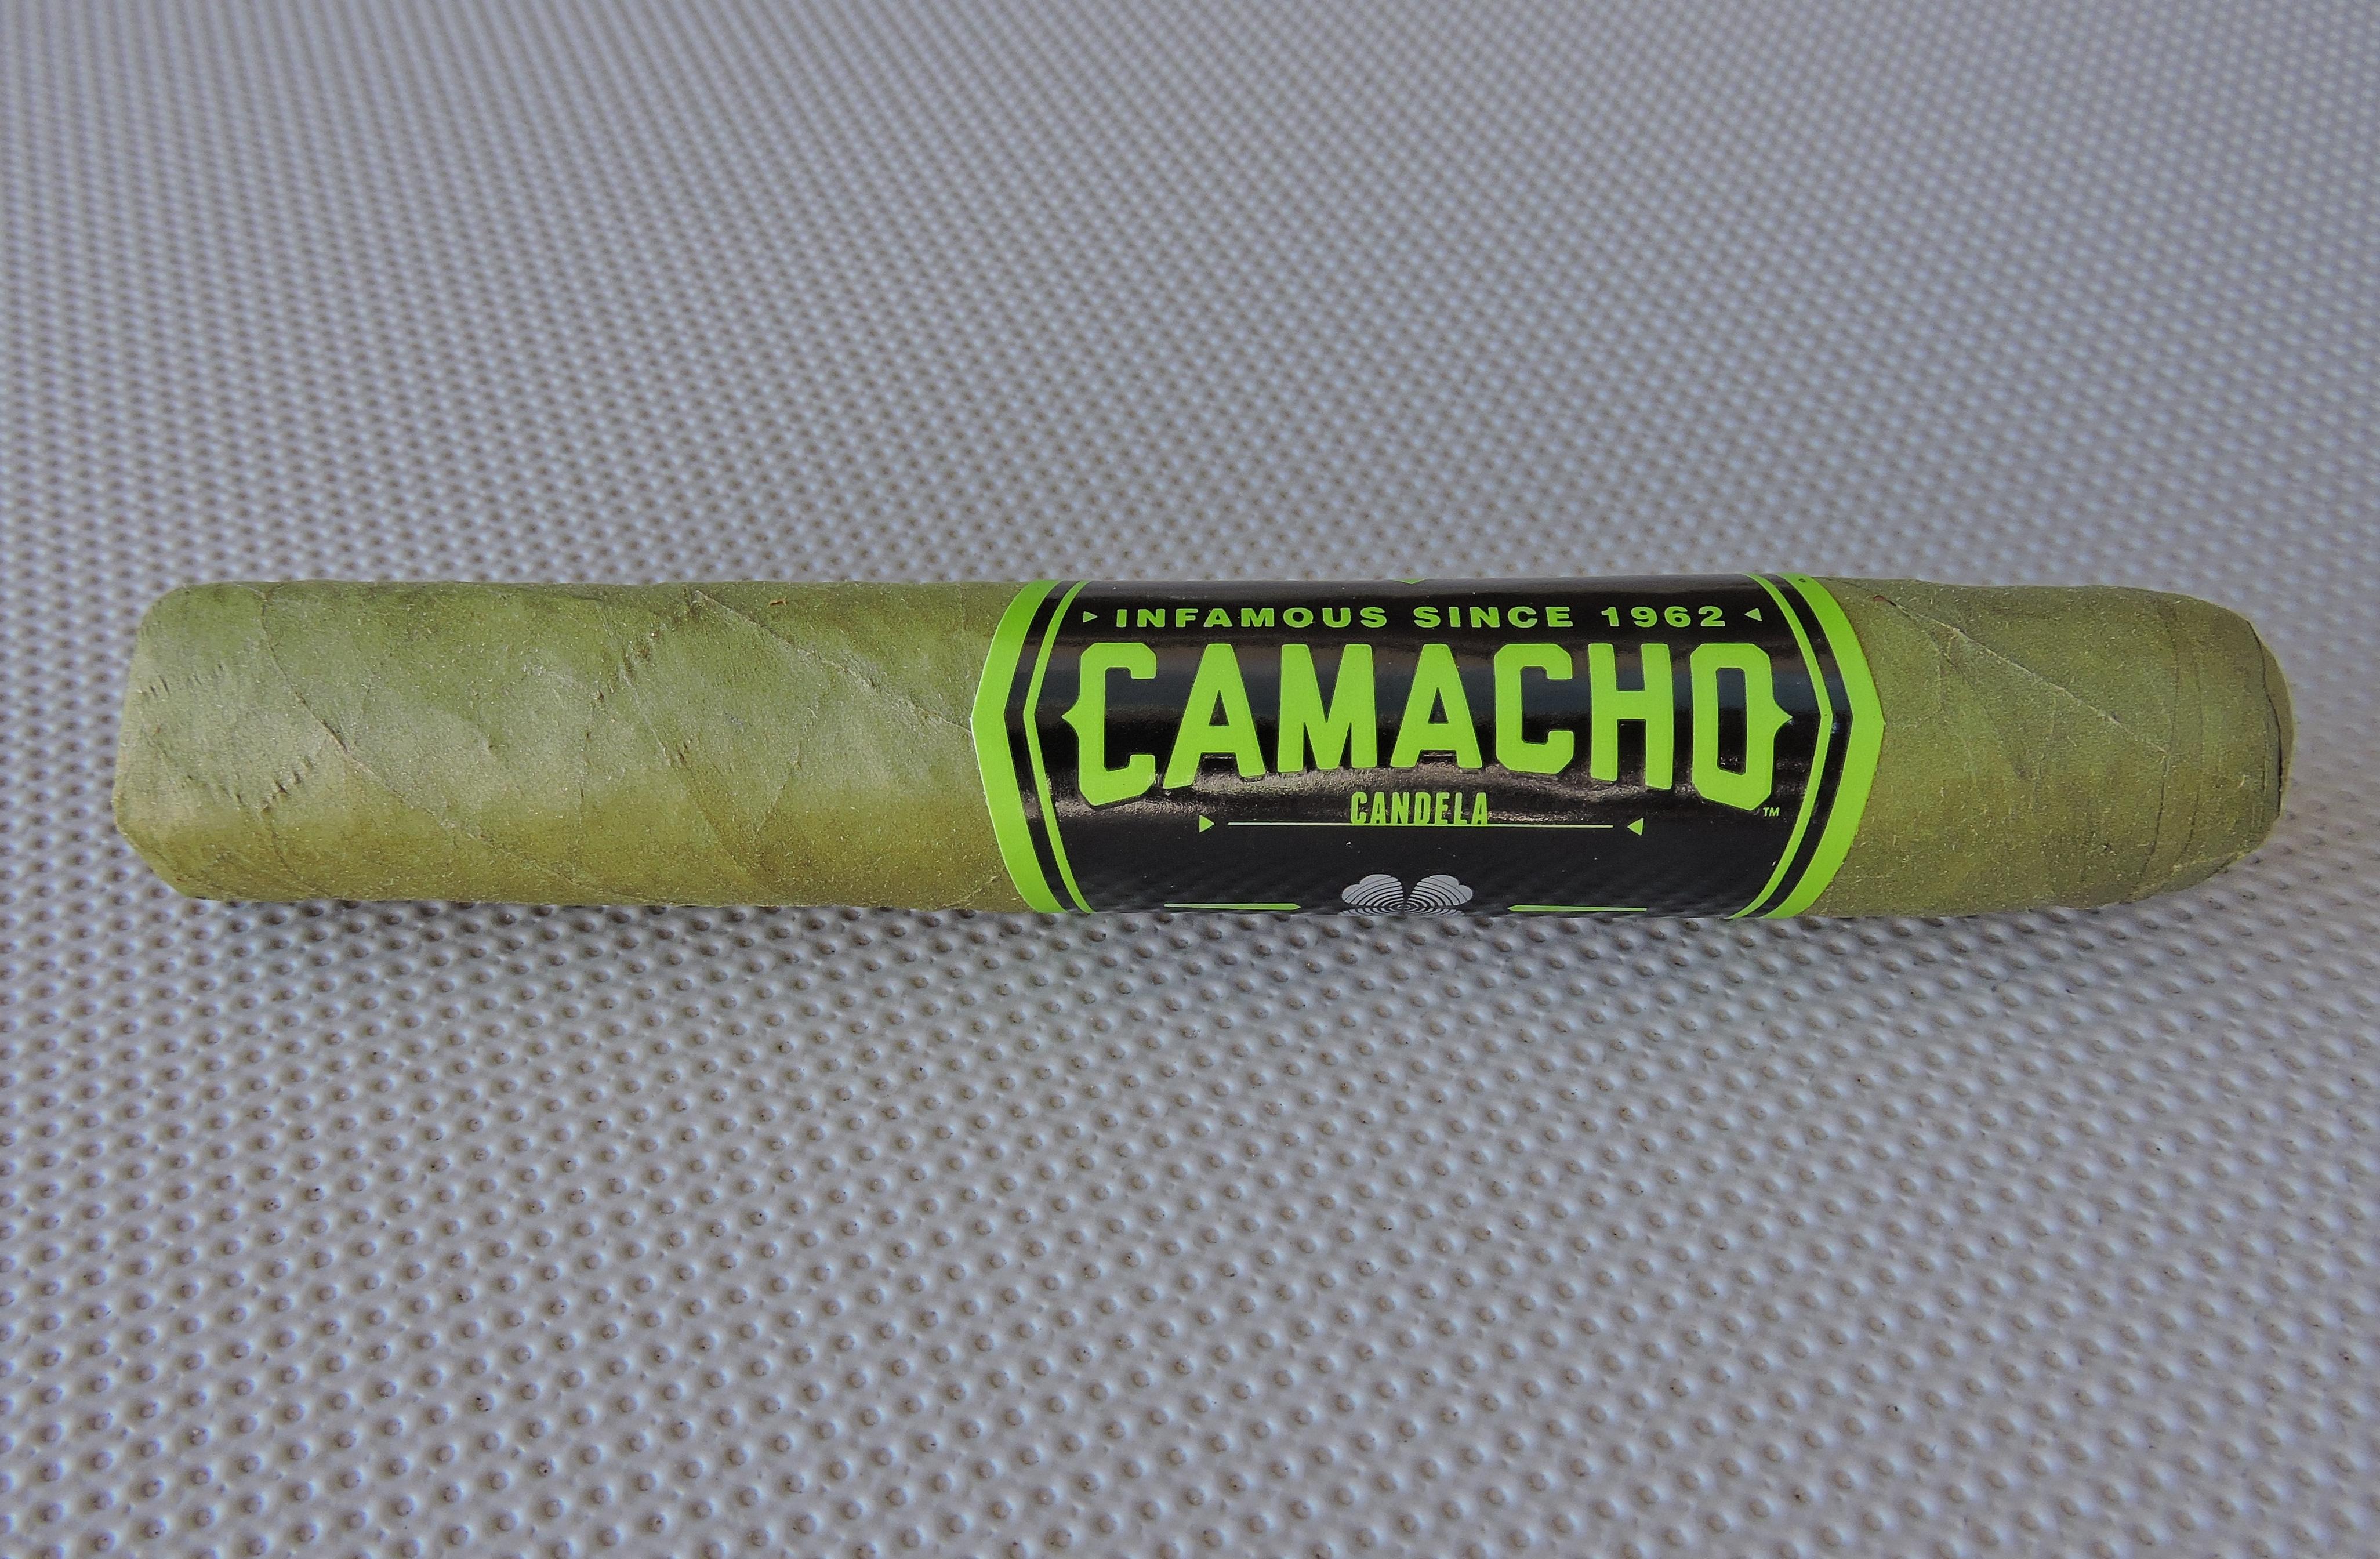 Cigar Review: Camacho Candela Robusto (2018)